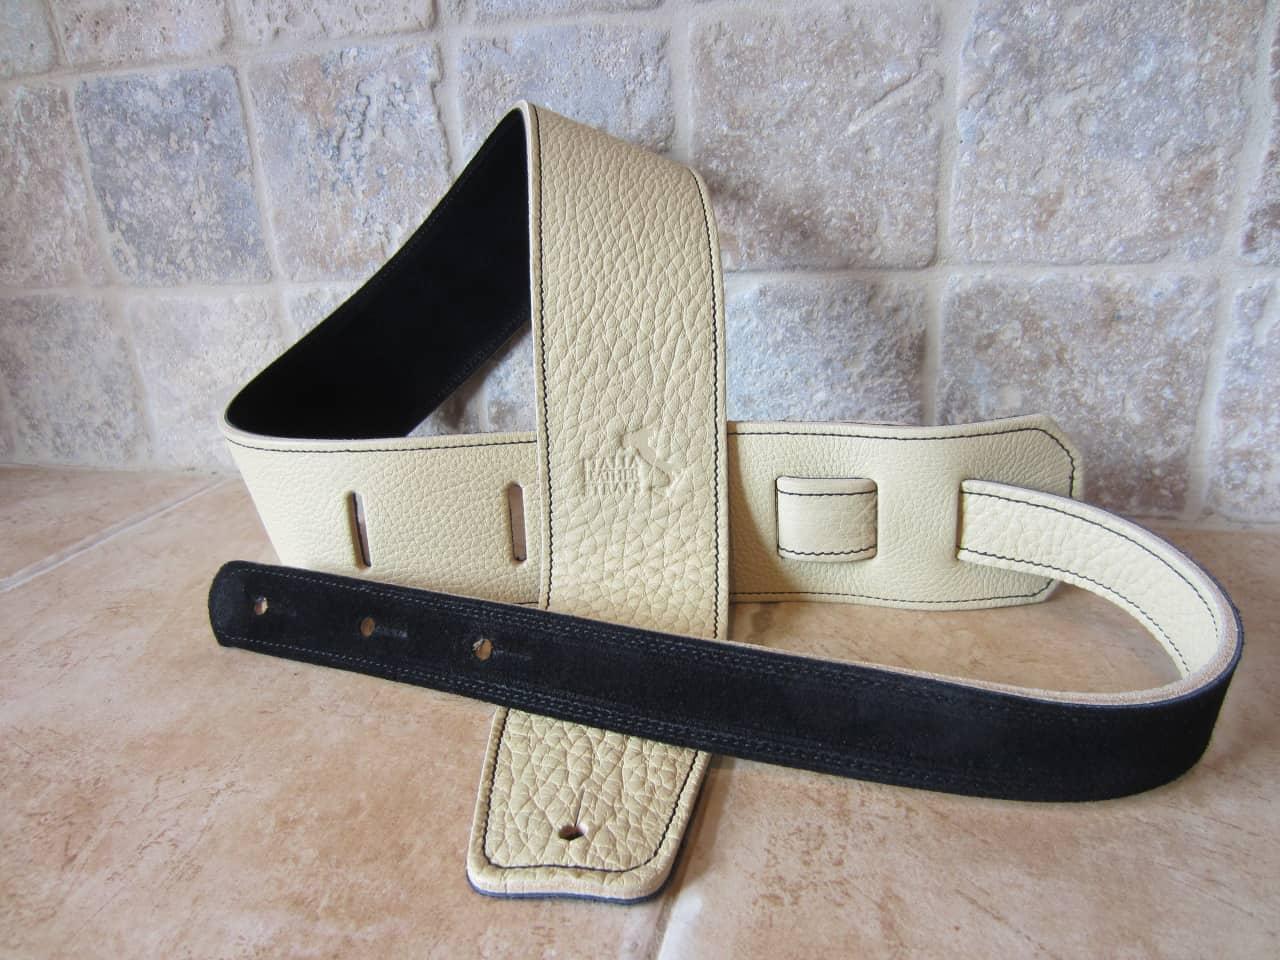 italia guitar straps 2 5 inch wide crema leather guitar strap reverb. Black Bedroom Furniture Sets. Home Design Ideas